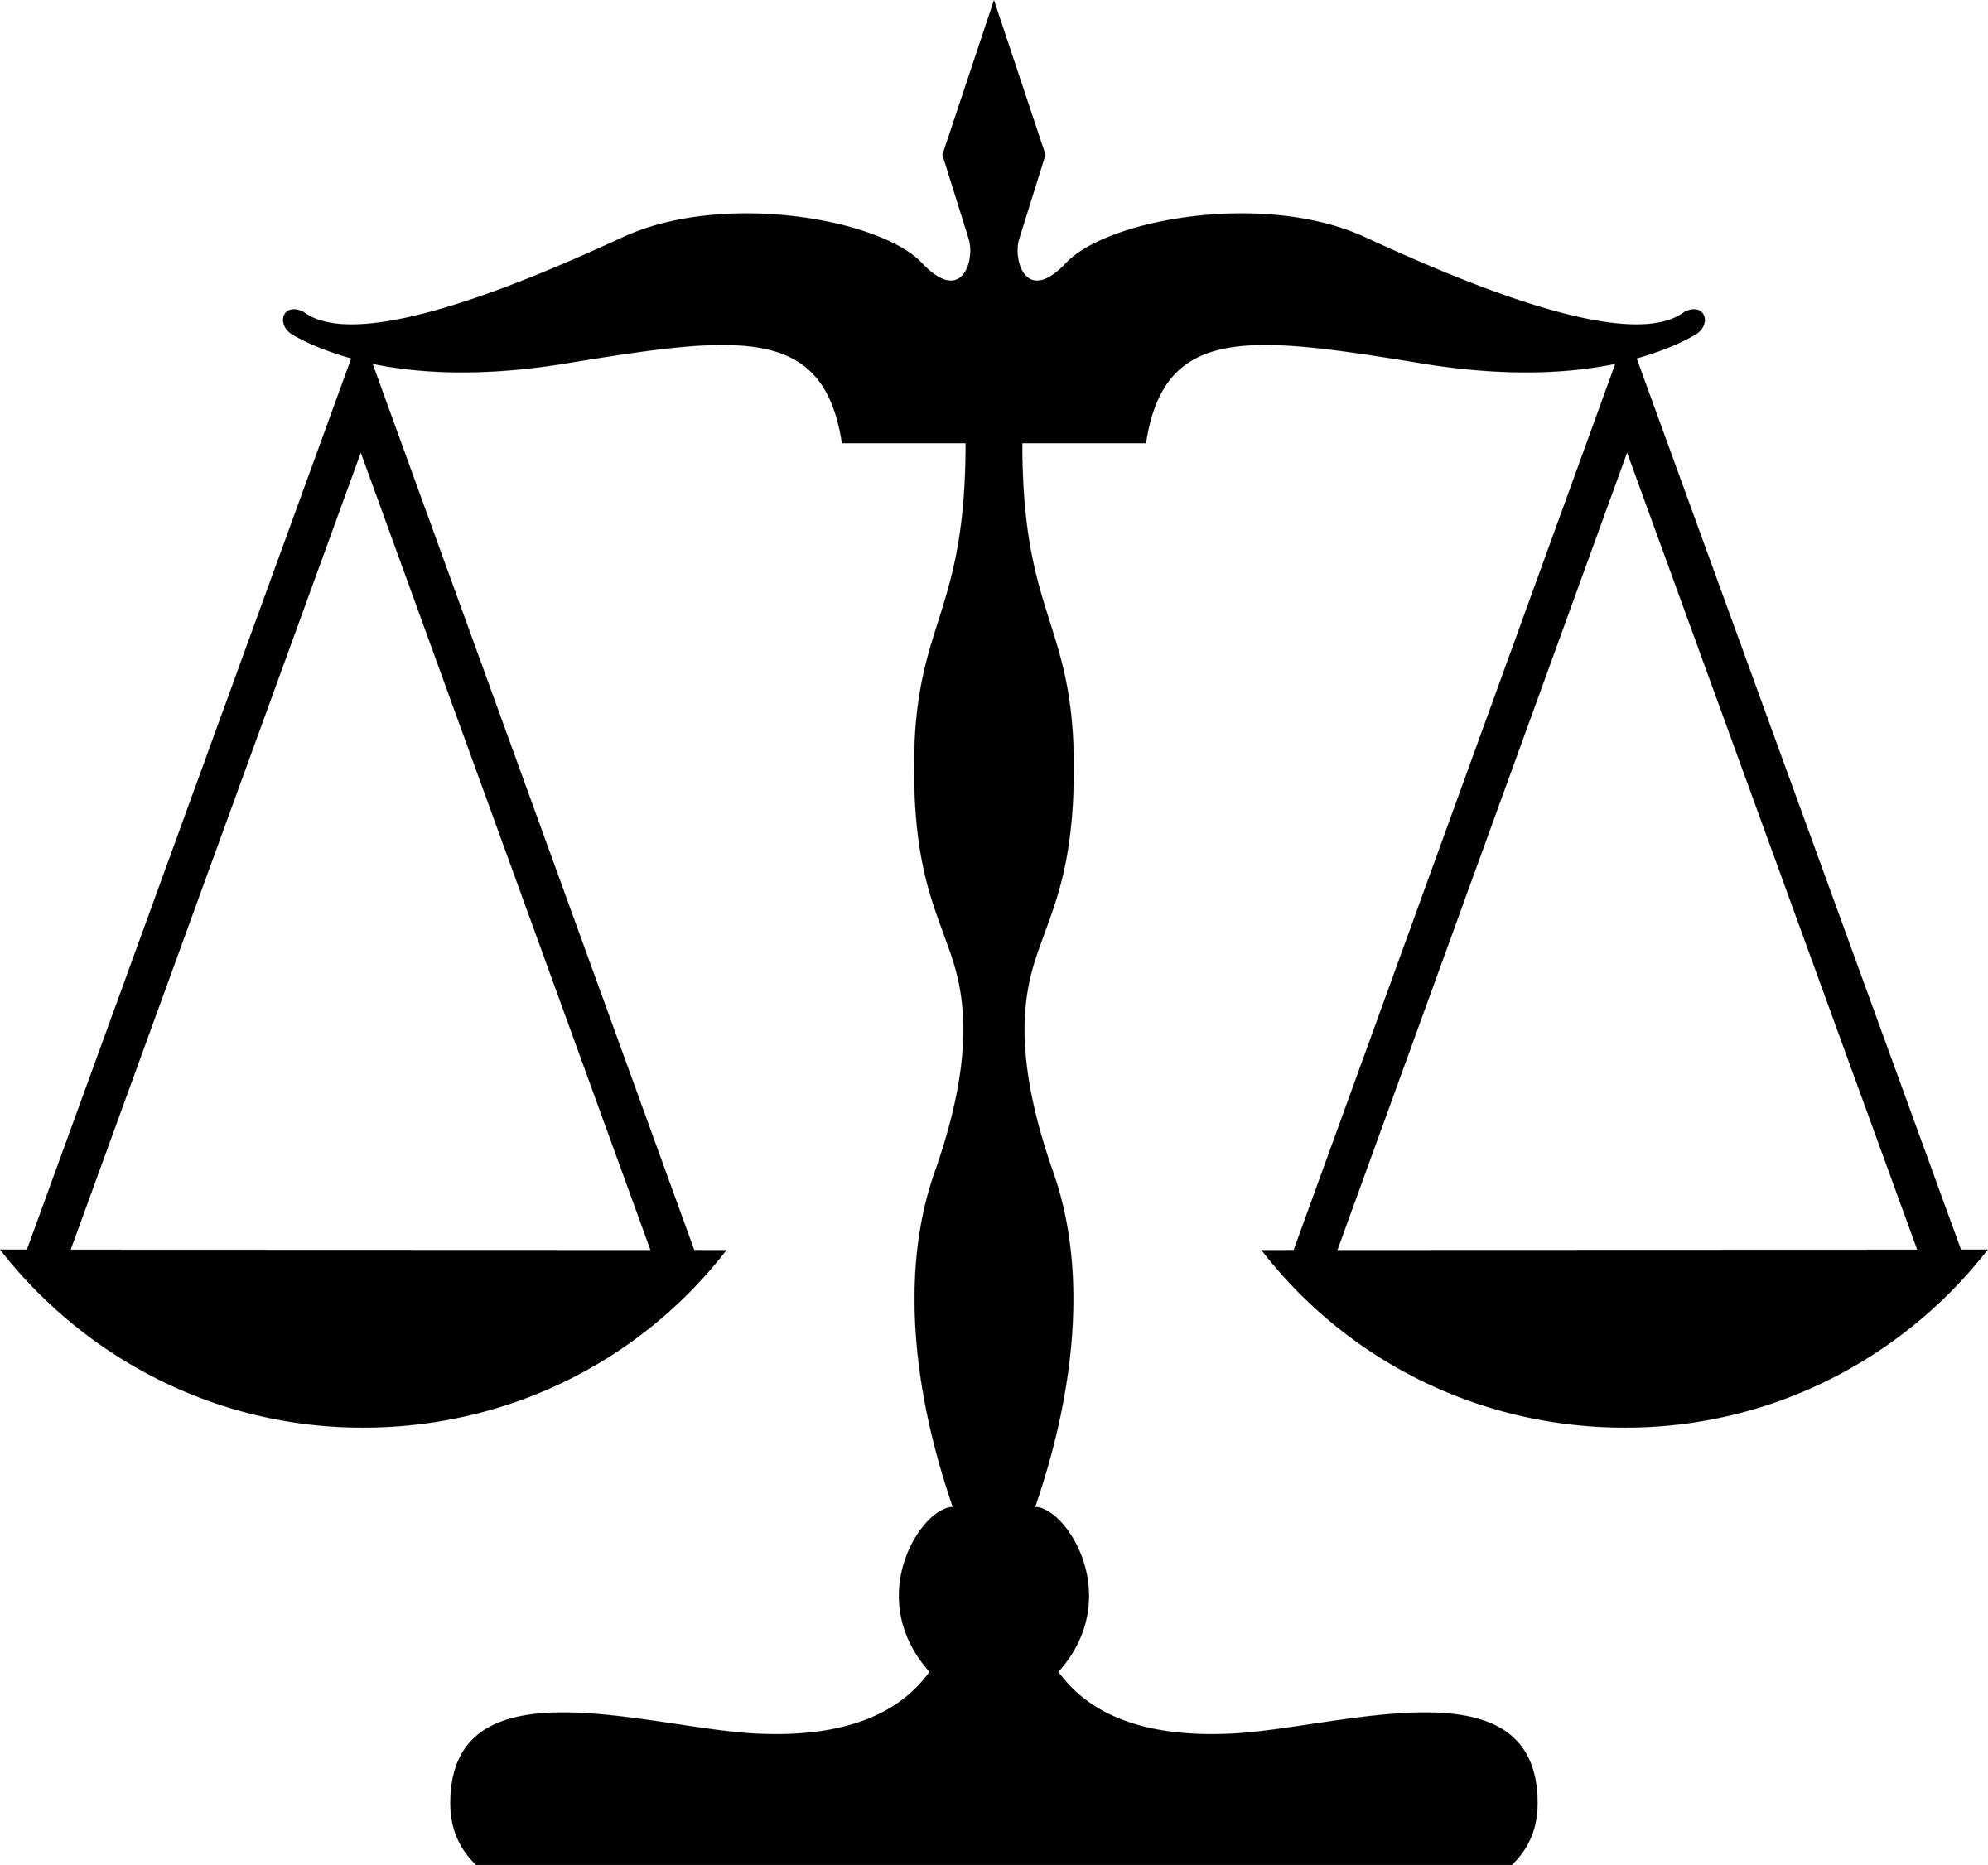 закон картинки символы верховного бога славян